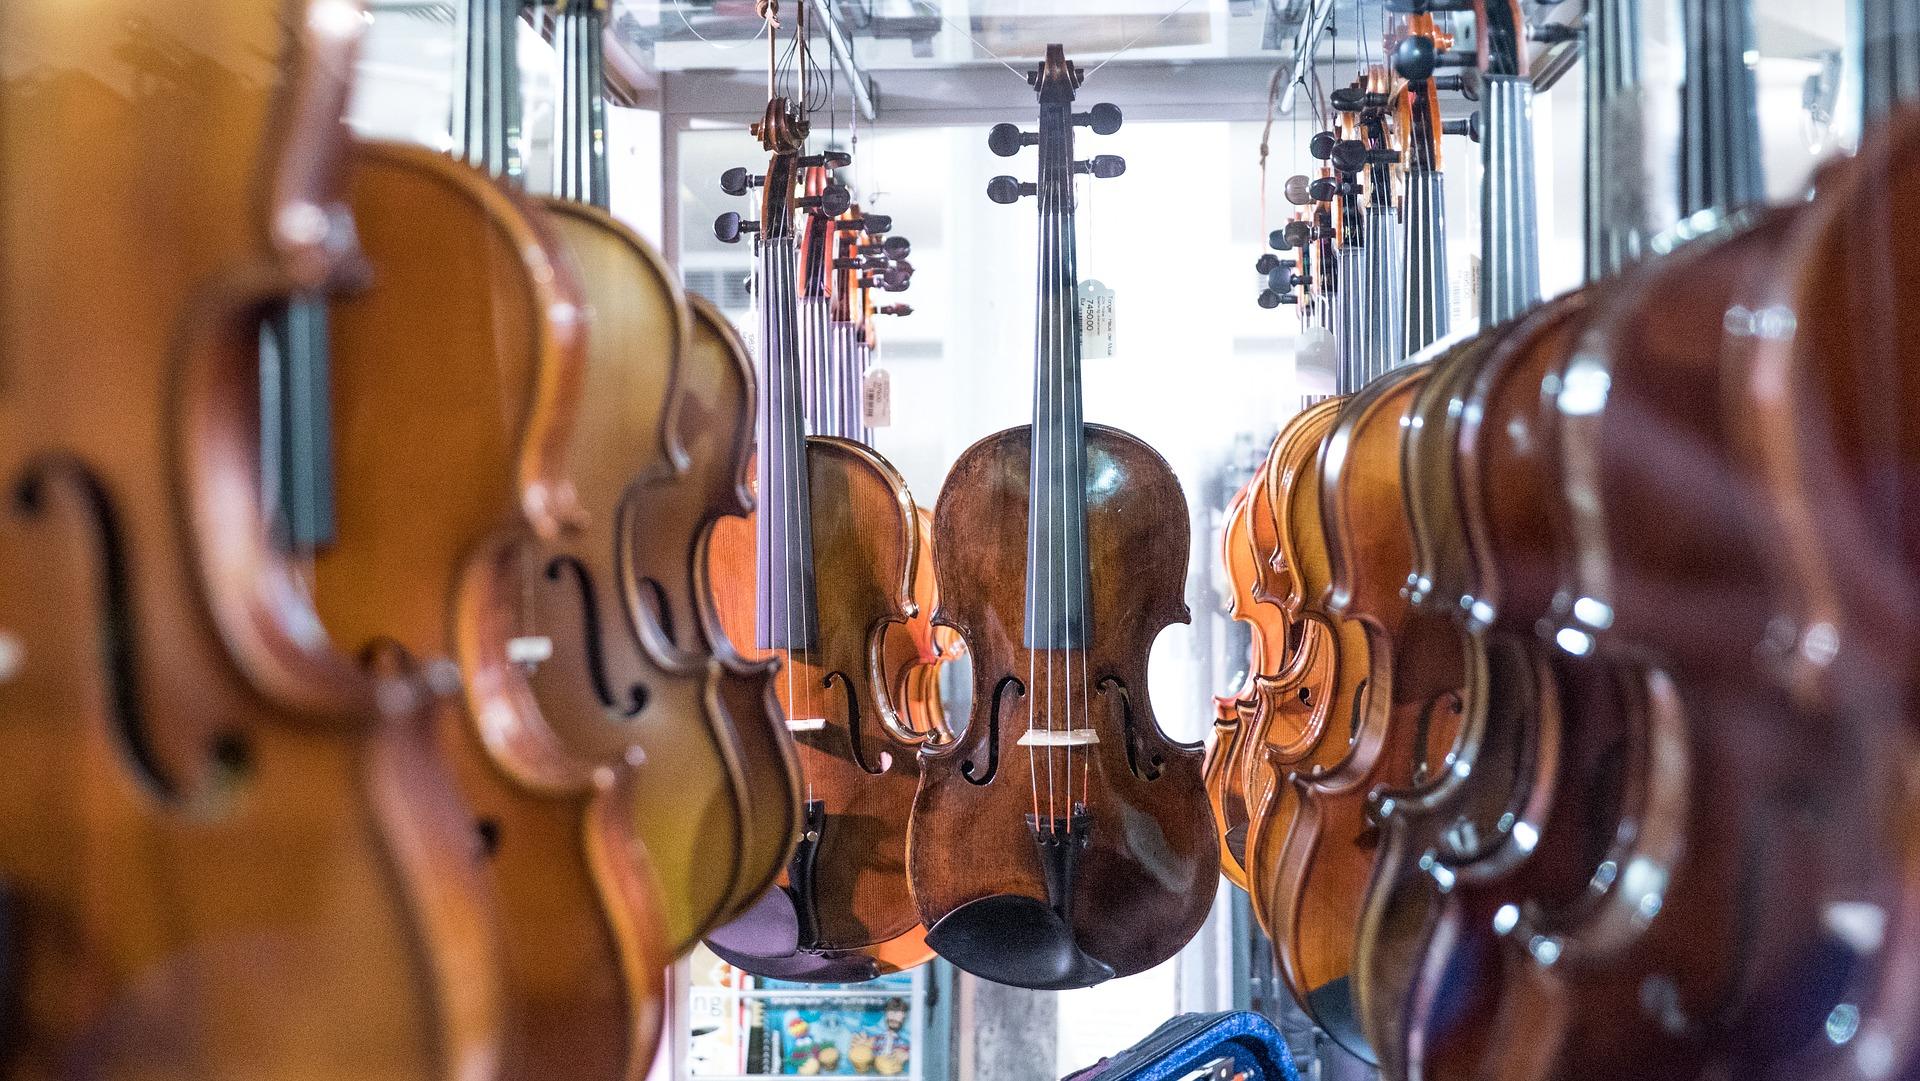 violon-allegro-musique-image-1